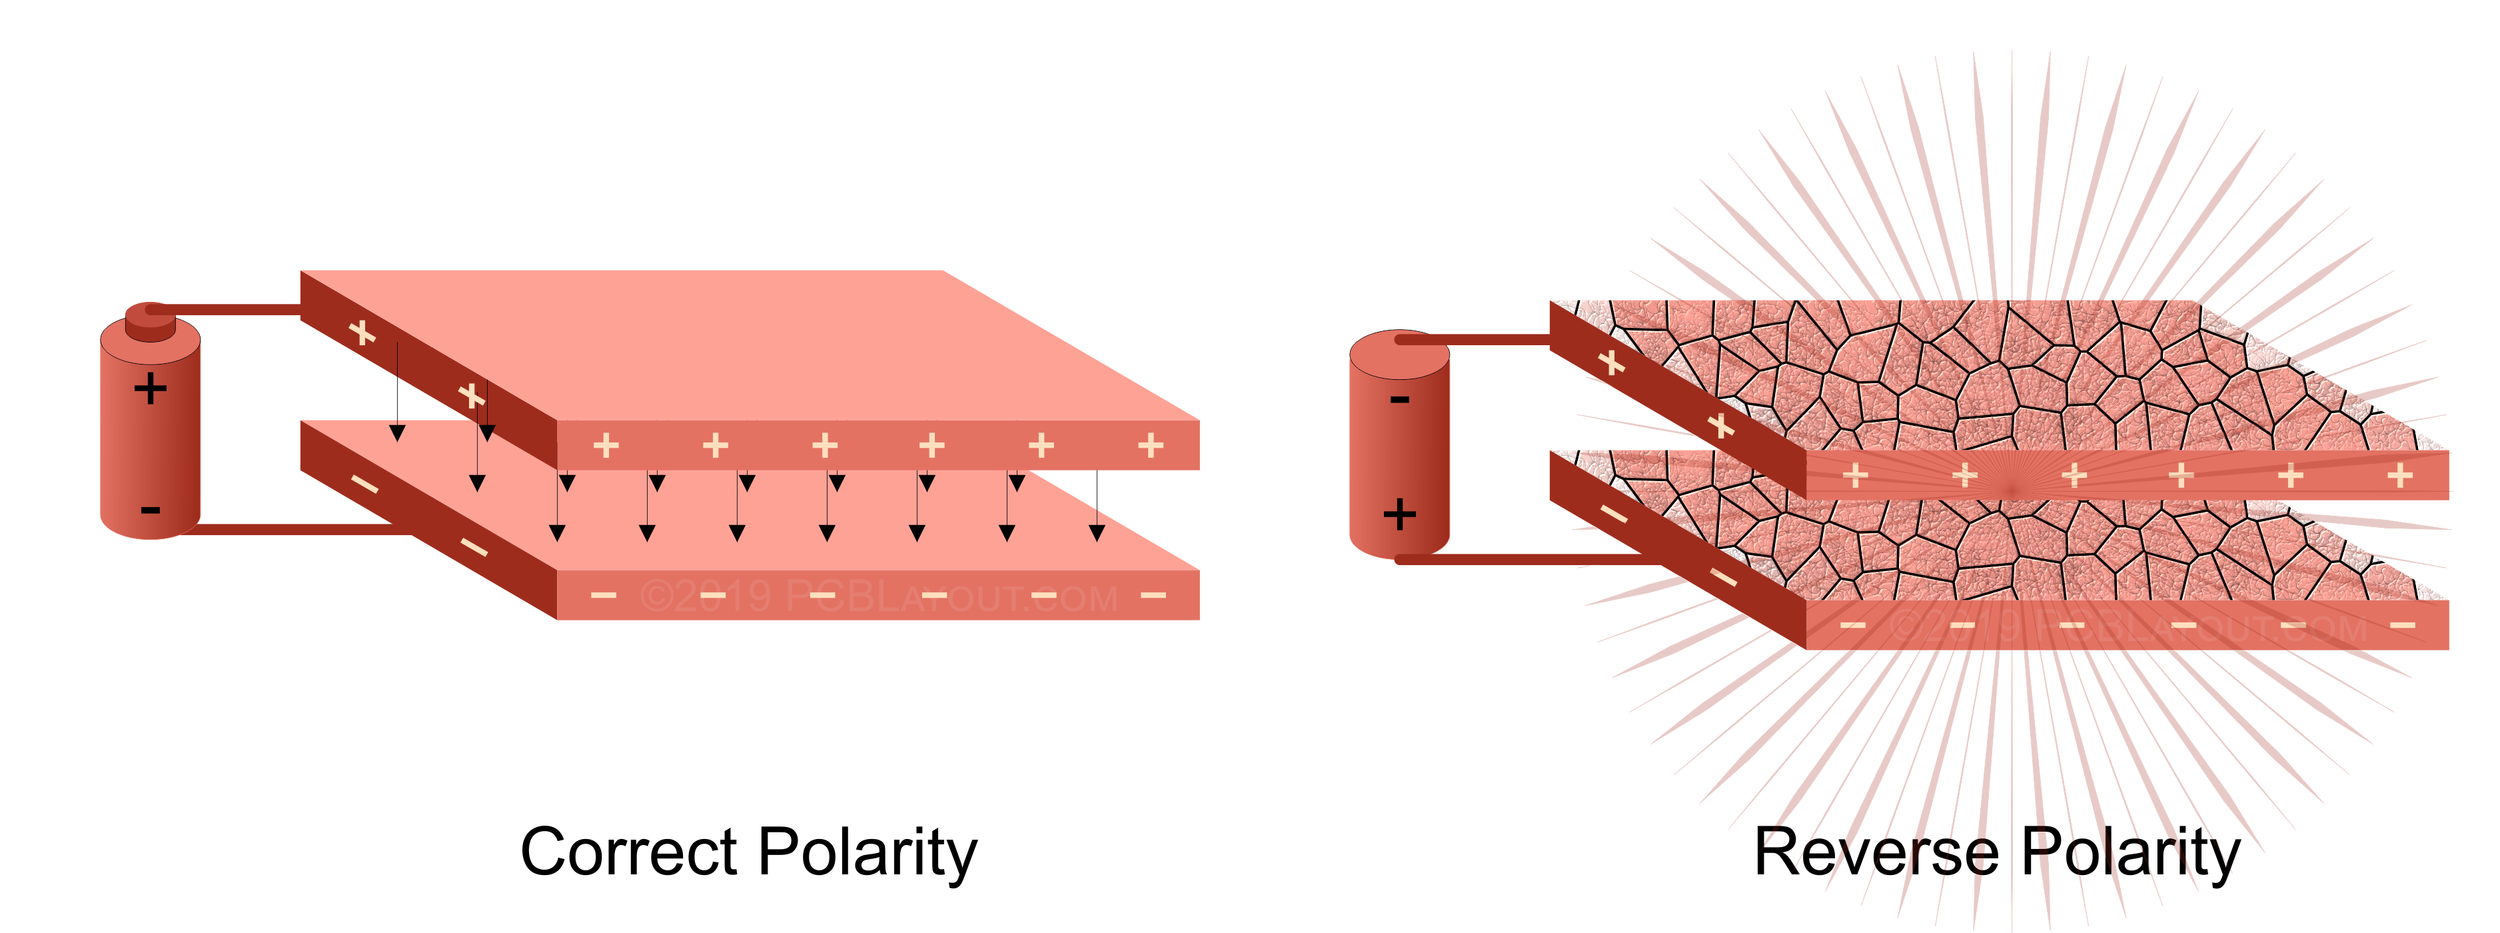 polarity_wrong_pic.png